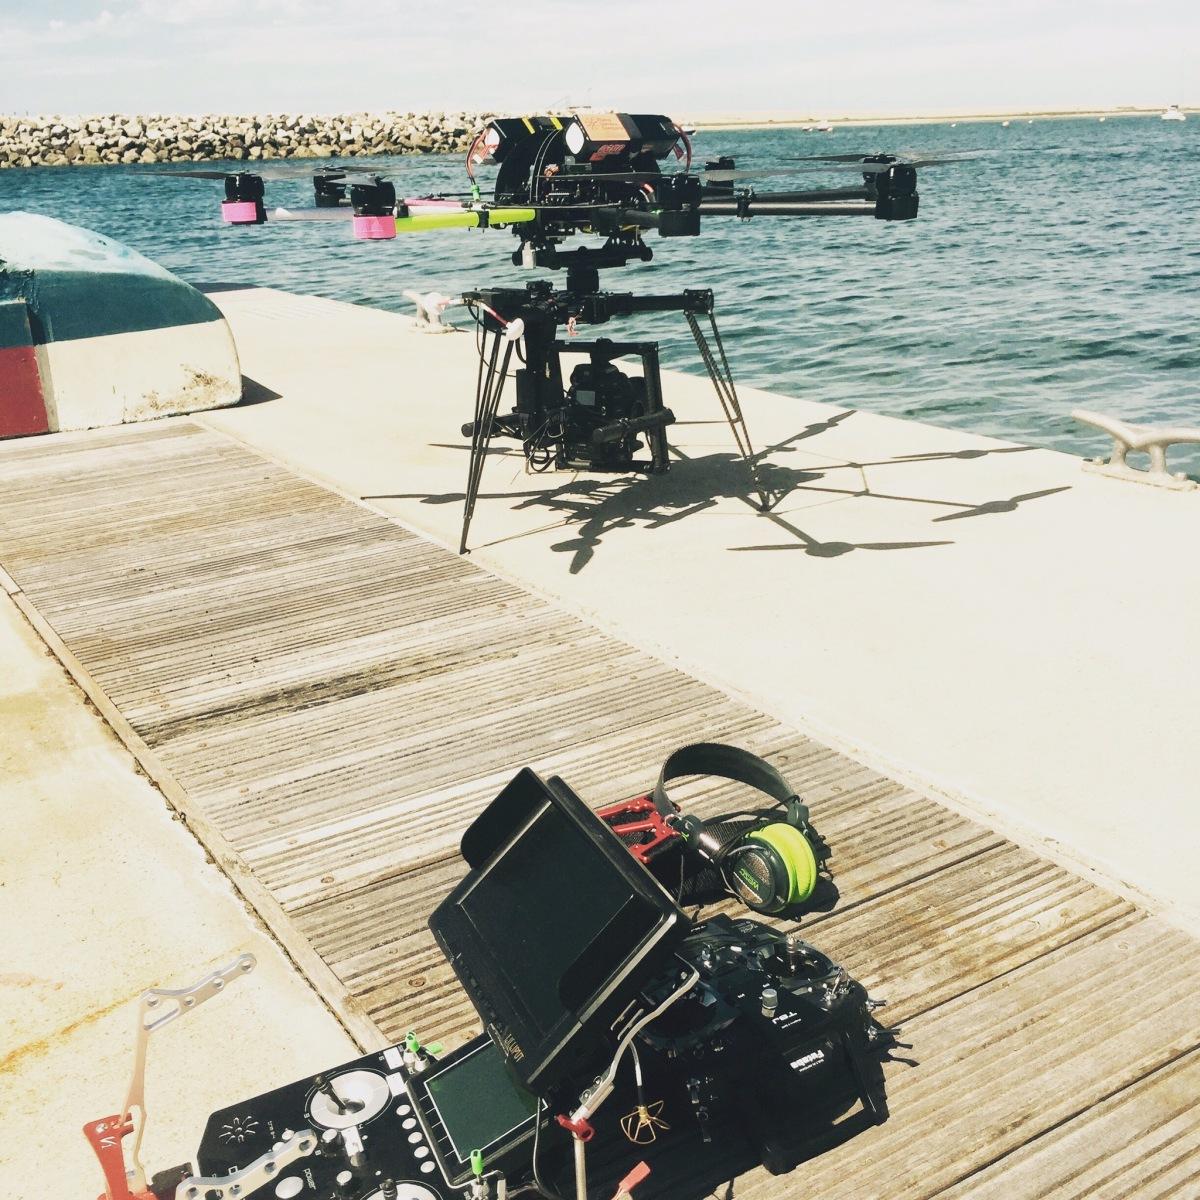 Drone, UAV, Octocopter, SUAS, Skyjib, Movi M15, C300